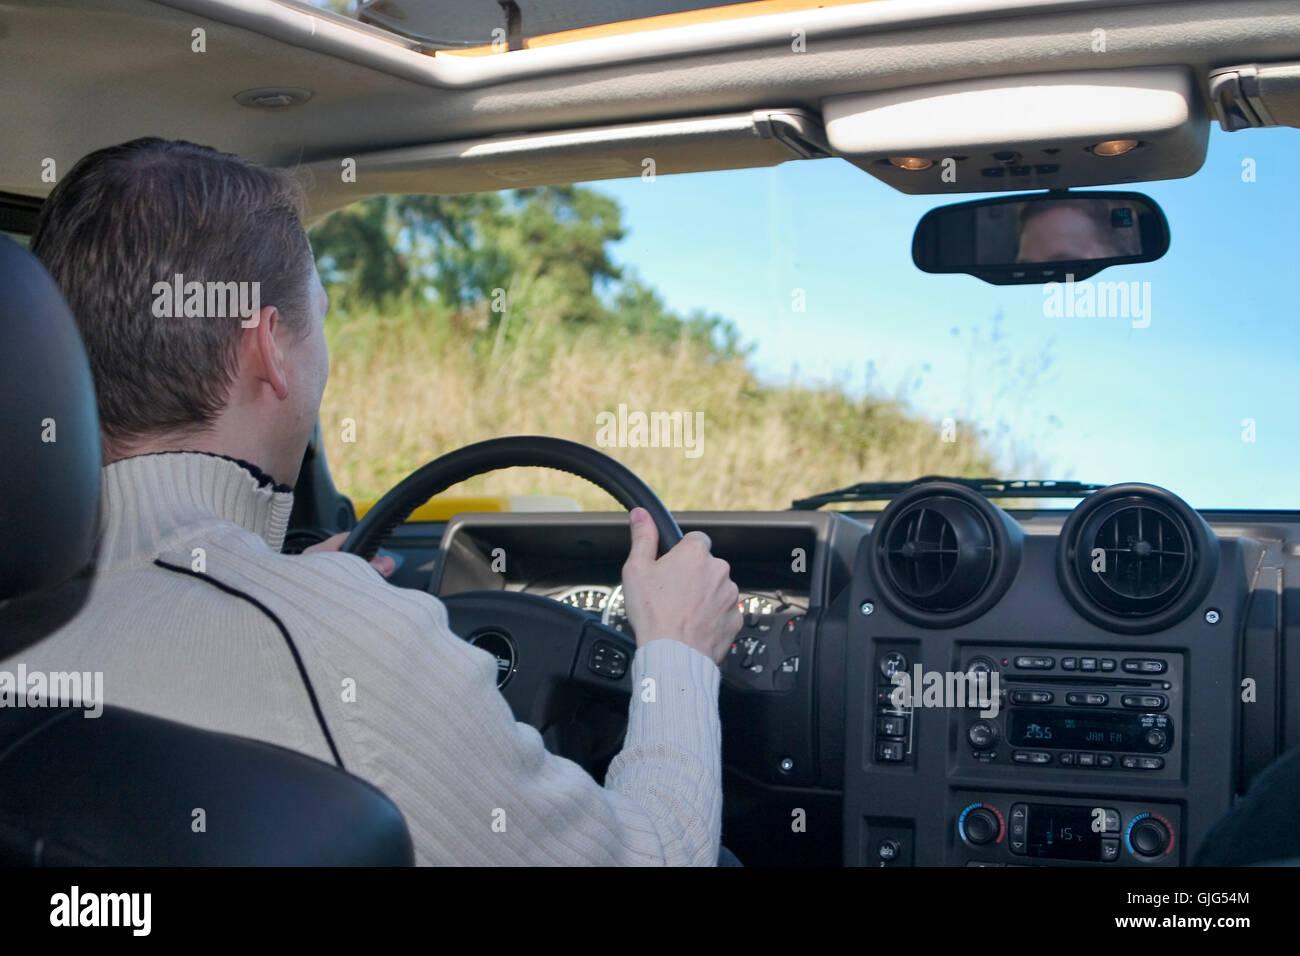 Car Hummer H2 Cross Country Stockfotos & Car Hummer H2 Cross Country ...